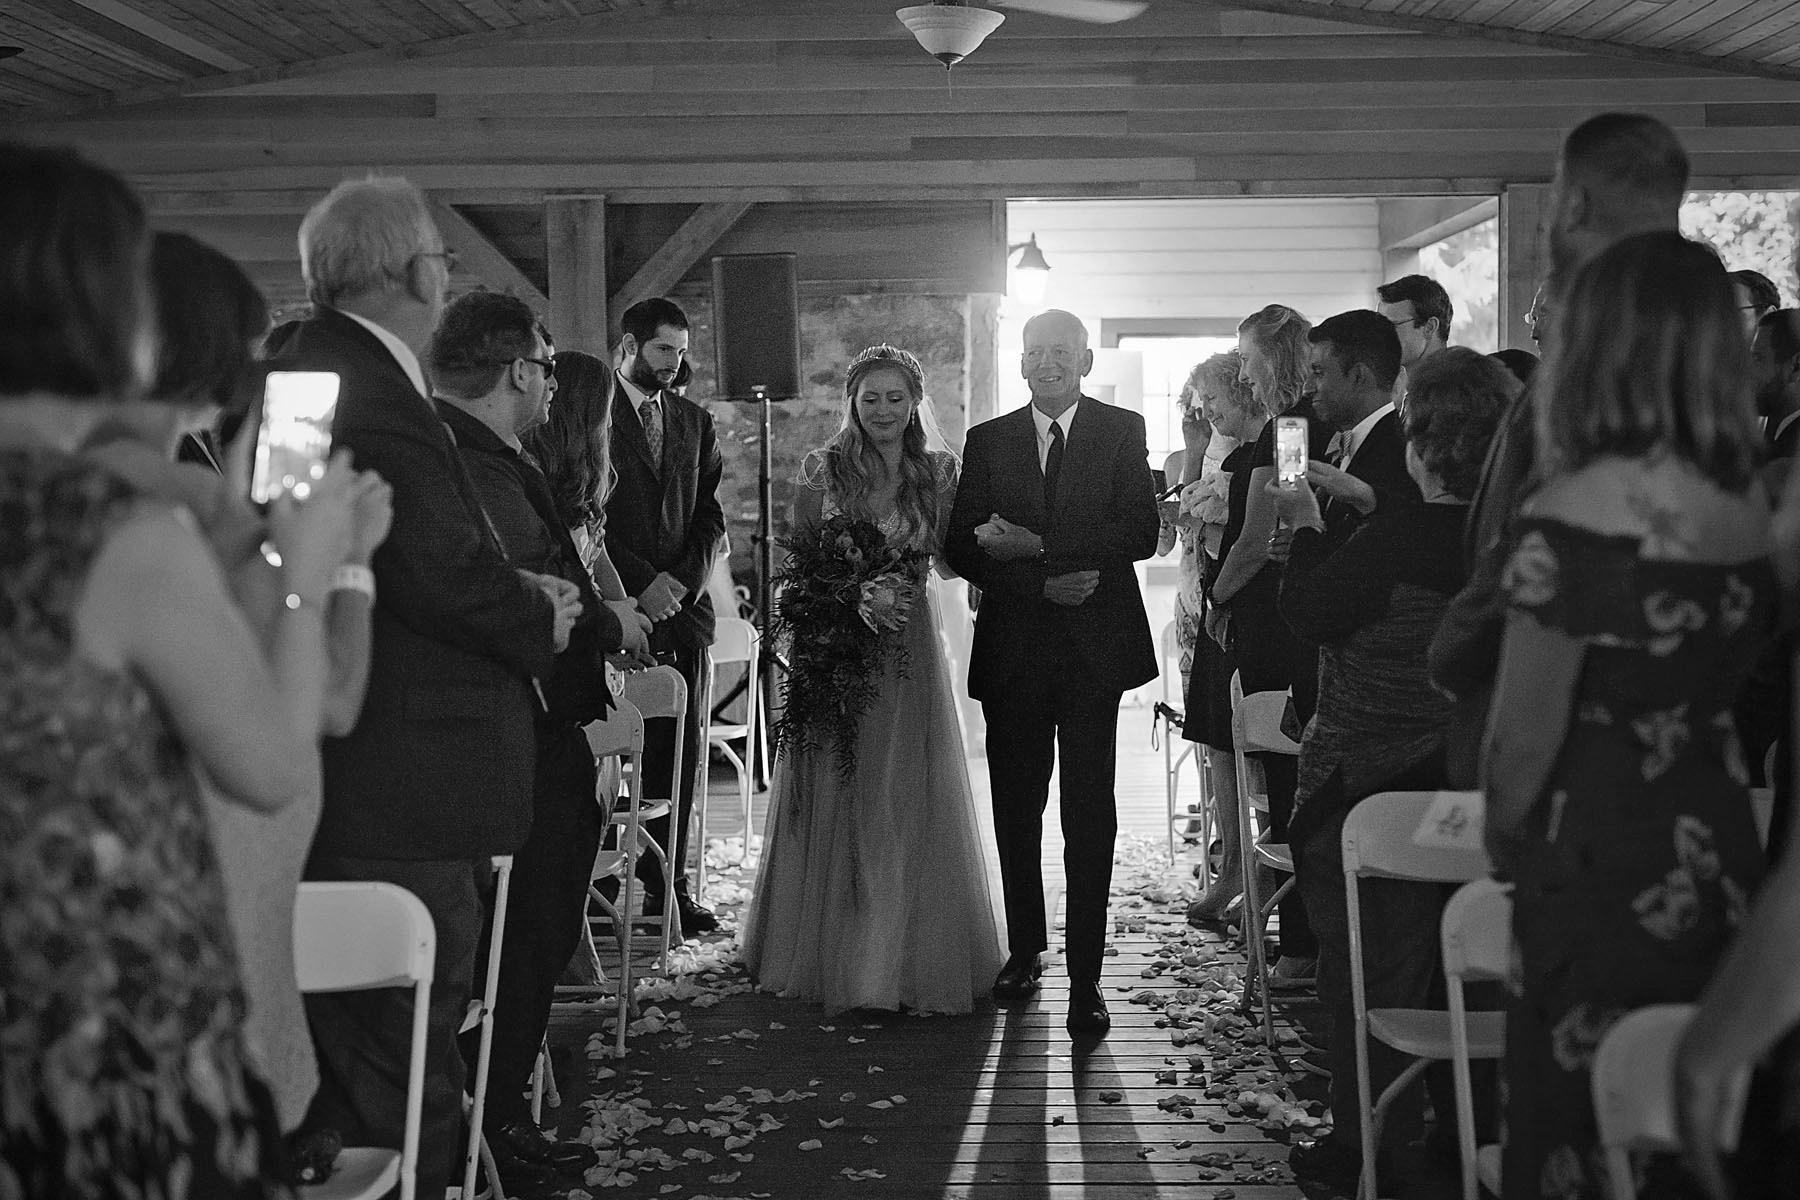 Bucks_County_wedding_photographer_Stroudsmoor_country_inn_wedding_Philadelphia_wedding_photographer_12_here_comes_the_bride_stroudsmoor_country_inn.JPG